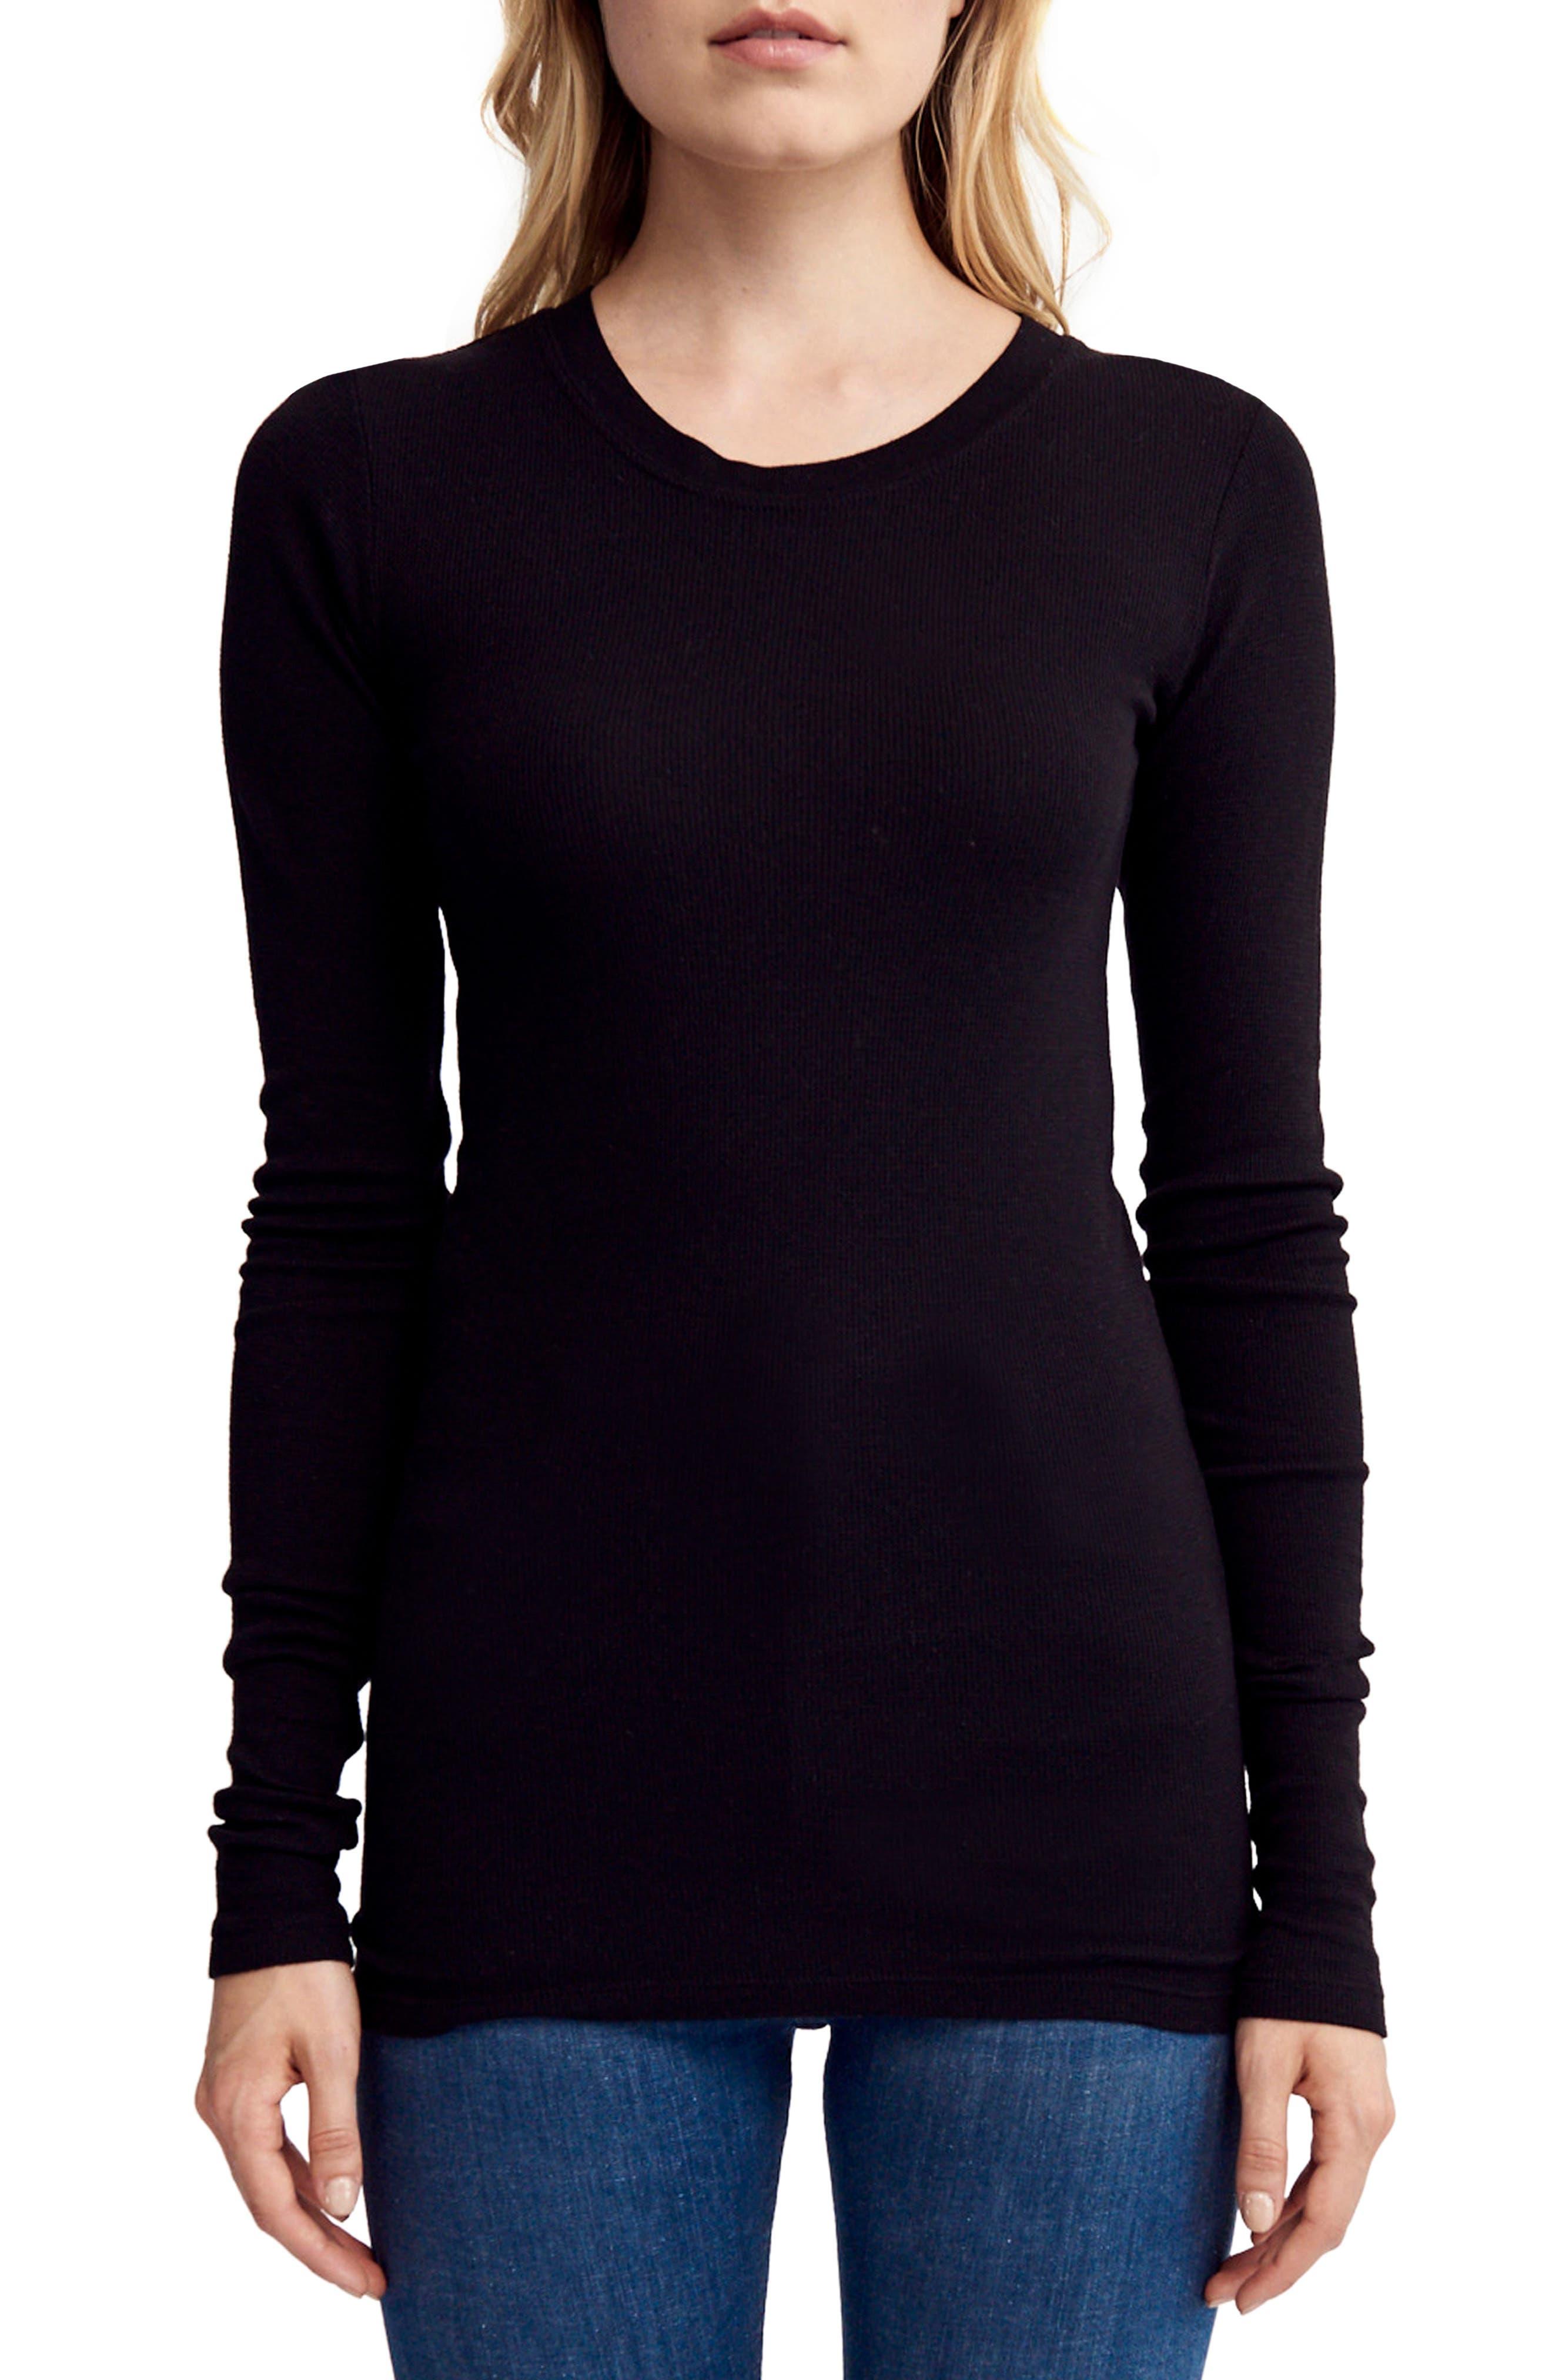 Alternate Image 1 Selected - LAmade Thermal Knit Top